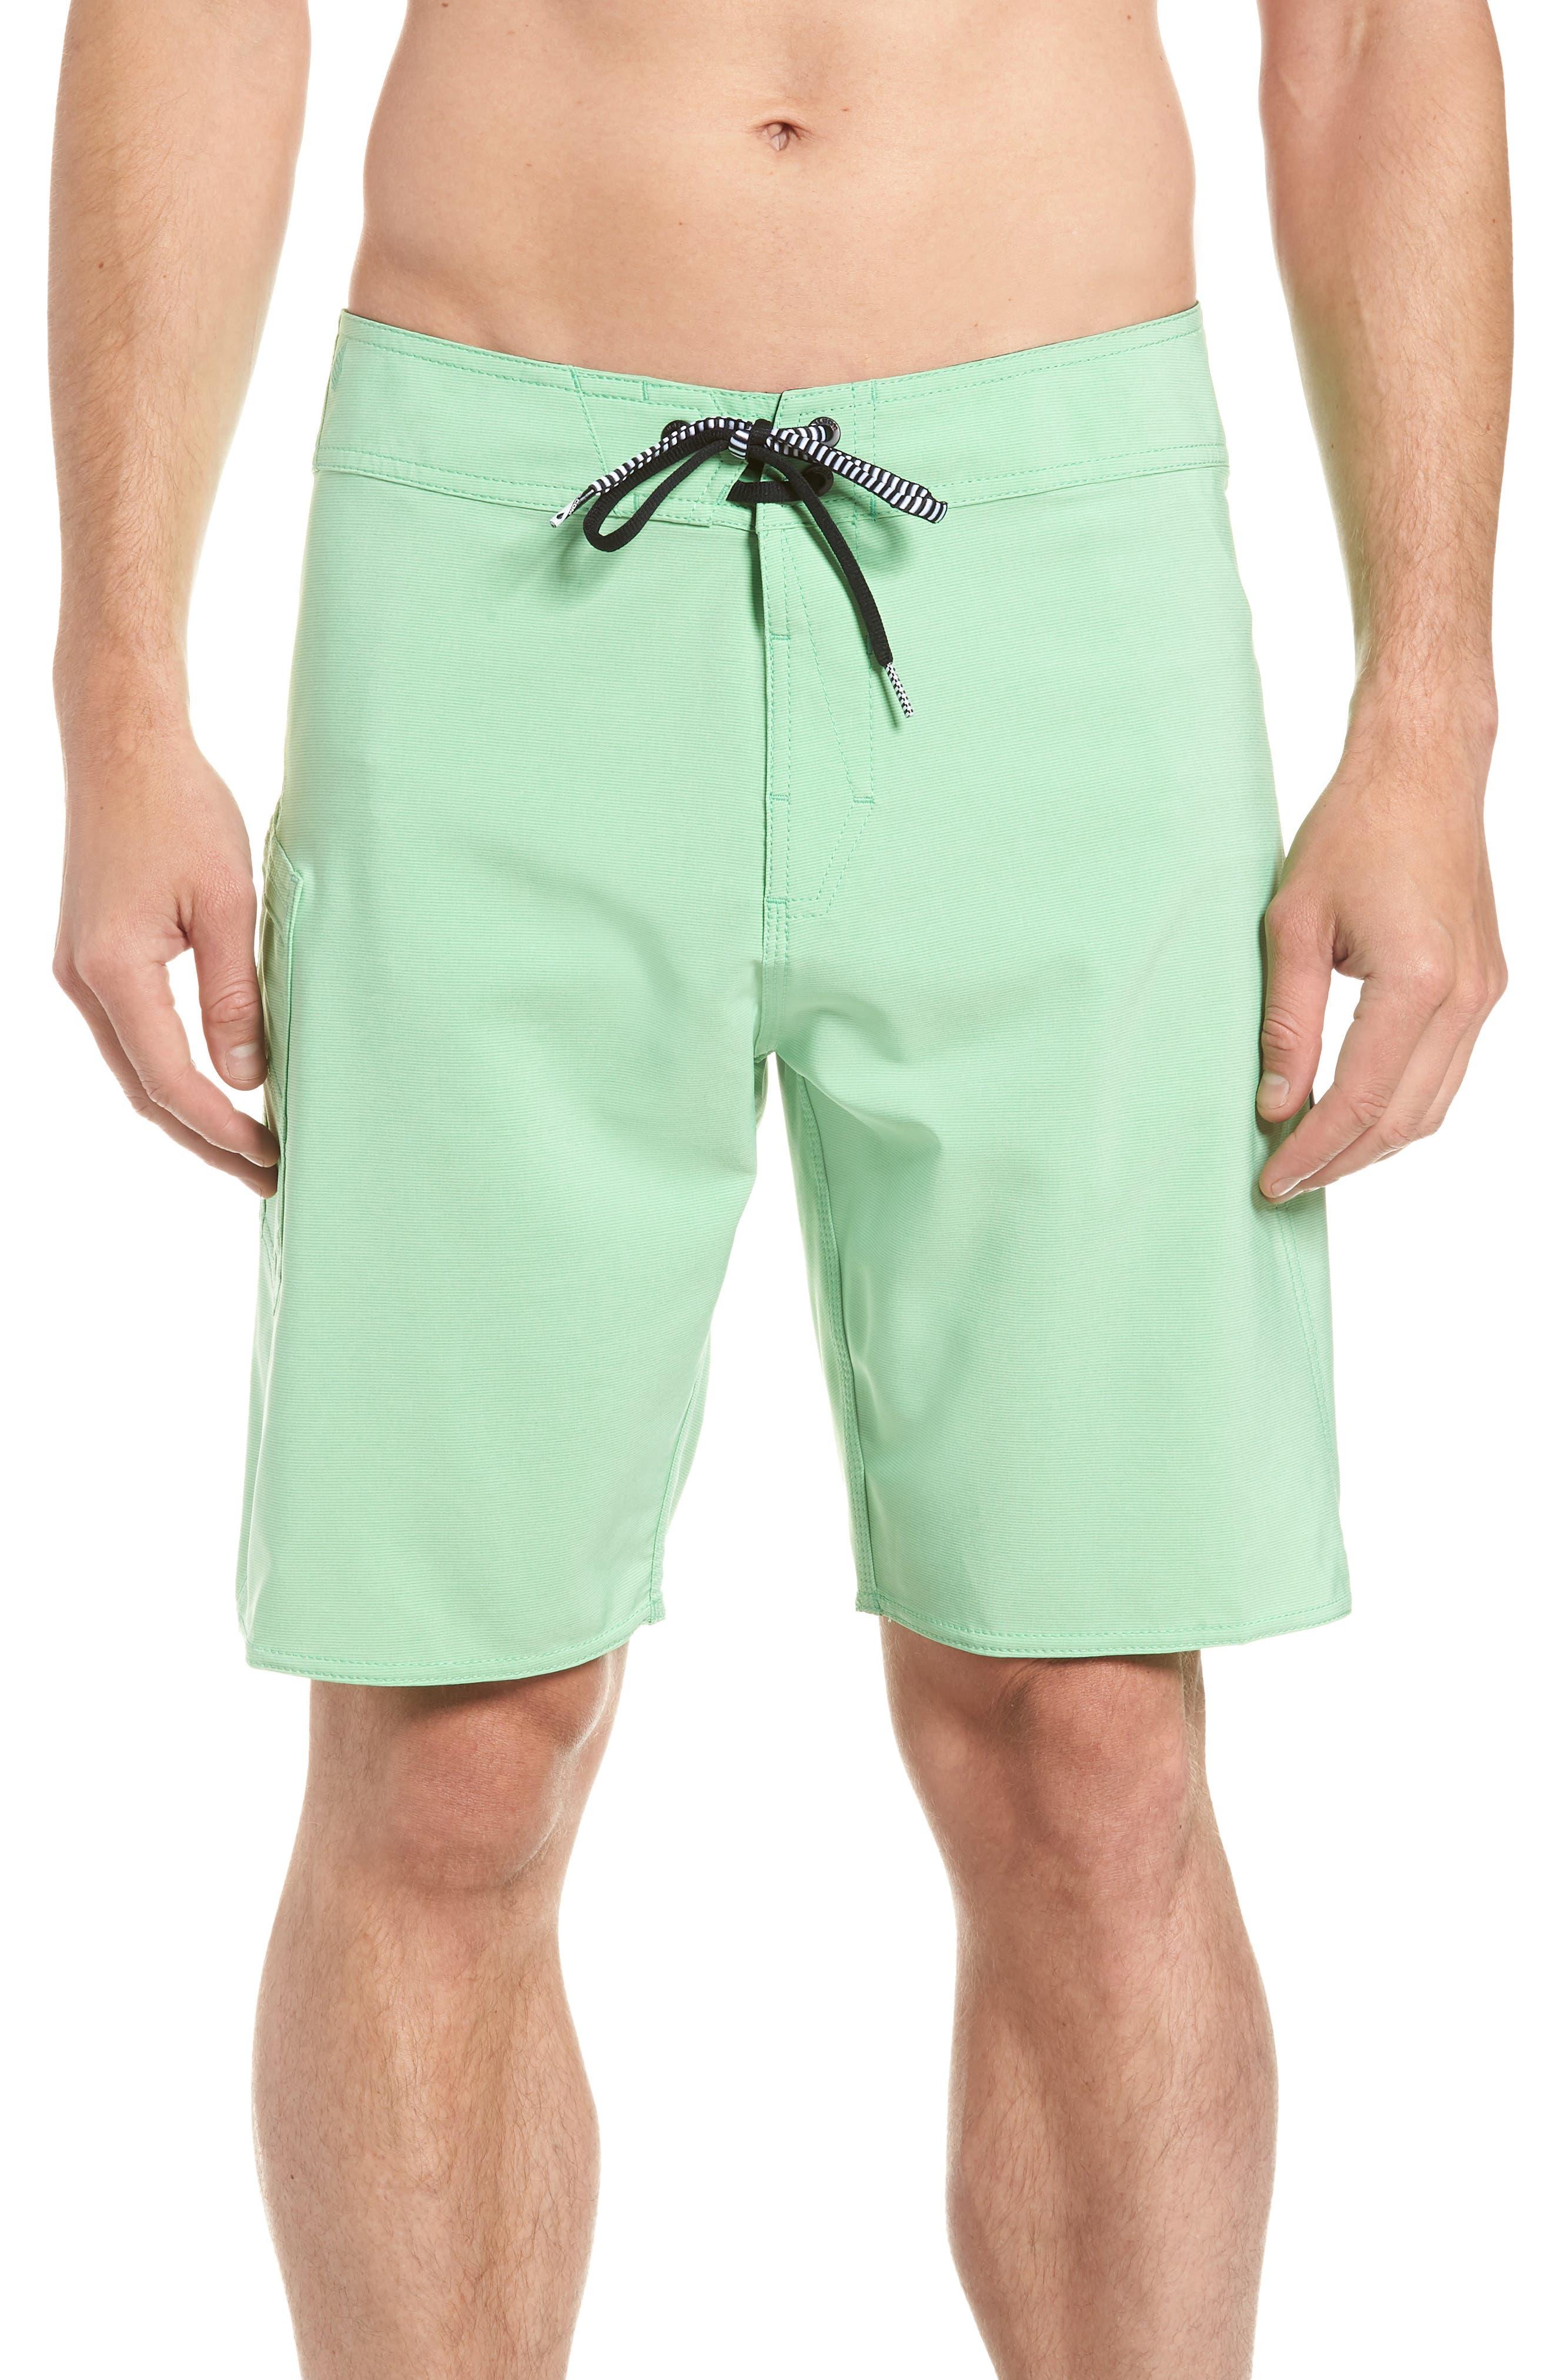 Lido Mod Board Shorts,                             Main thumbnail 1, color,                             POISON GREEN